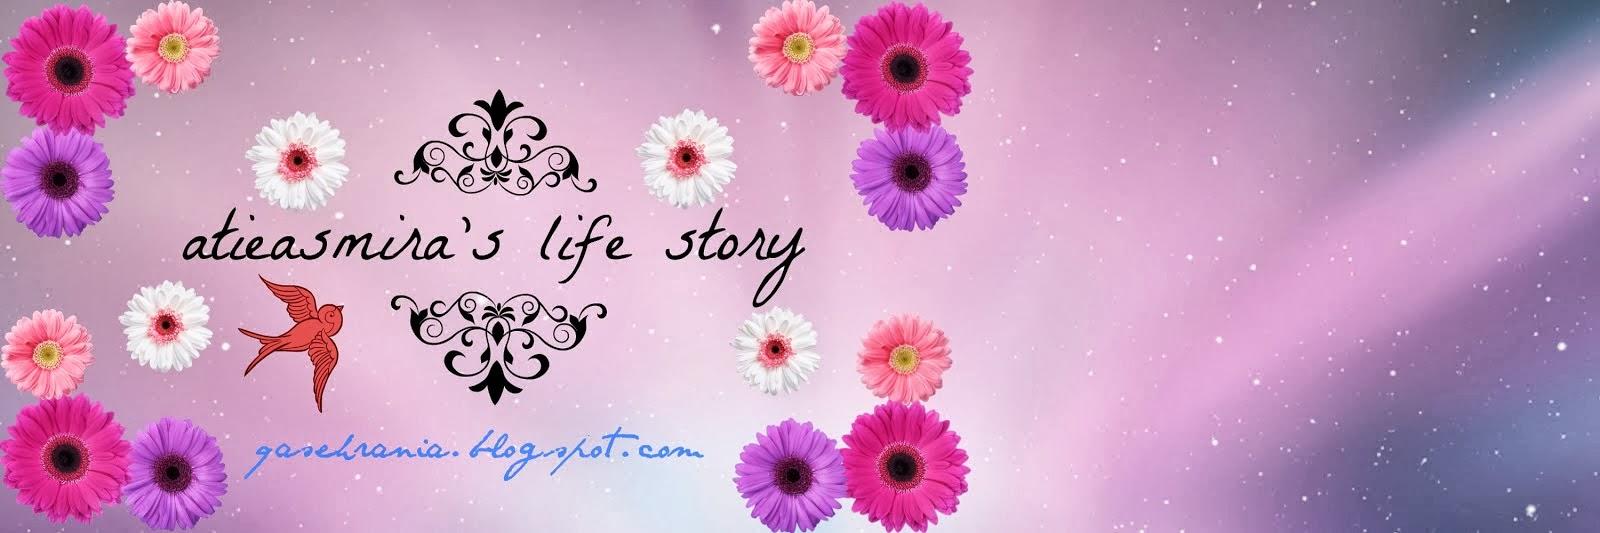 "atieasmira""s life story"